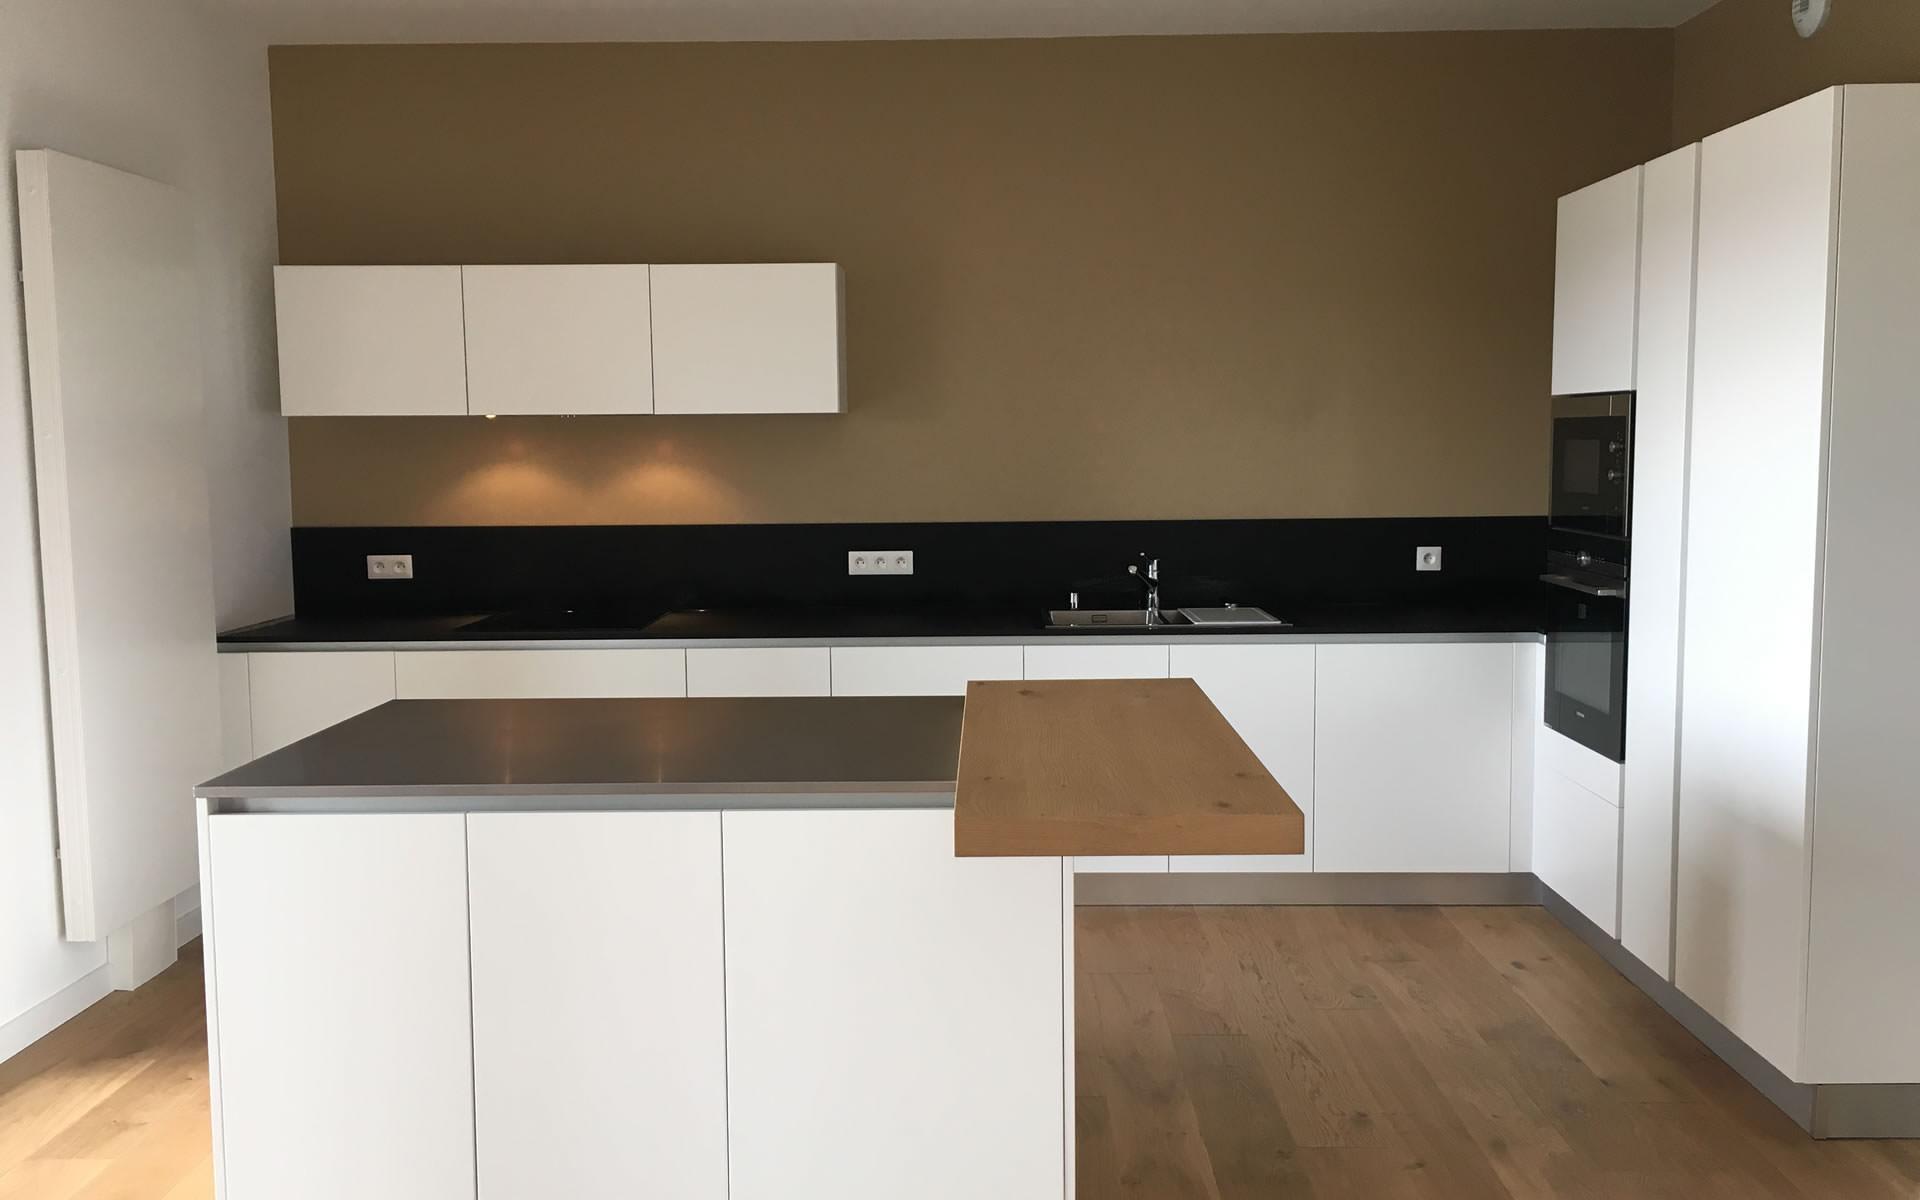 sp concept accueil sp concept. Black Bedroom Furniture Sets. Home Design Ideas